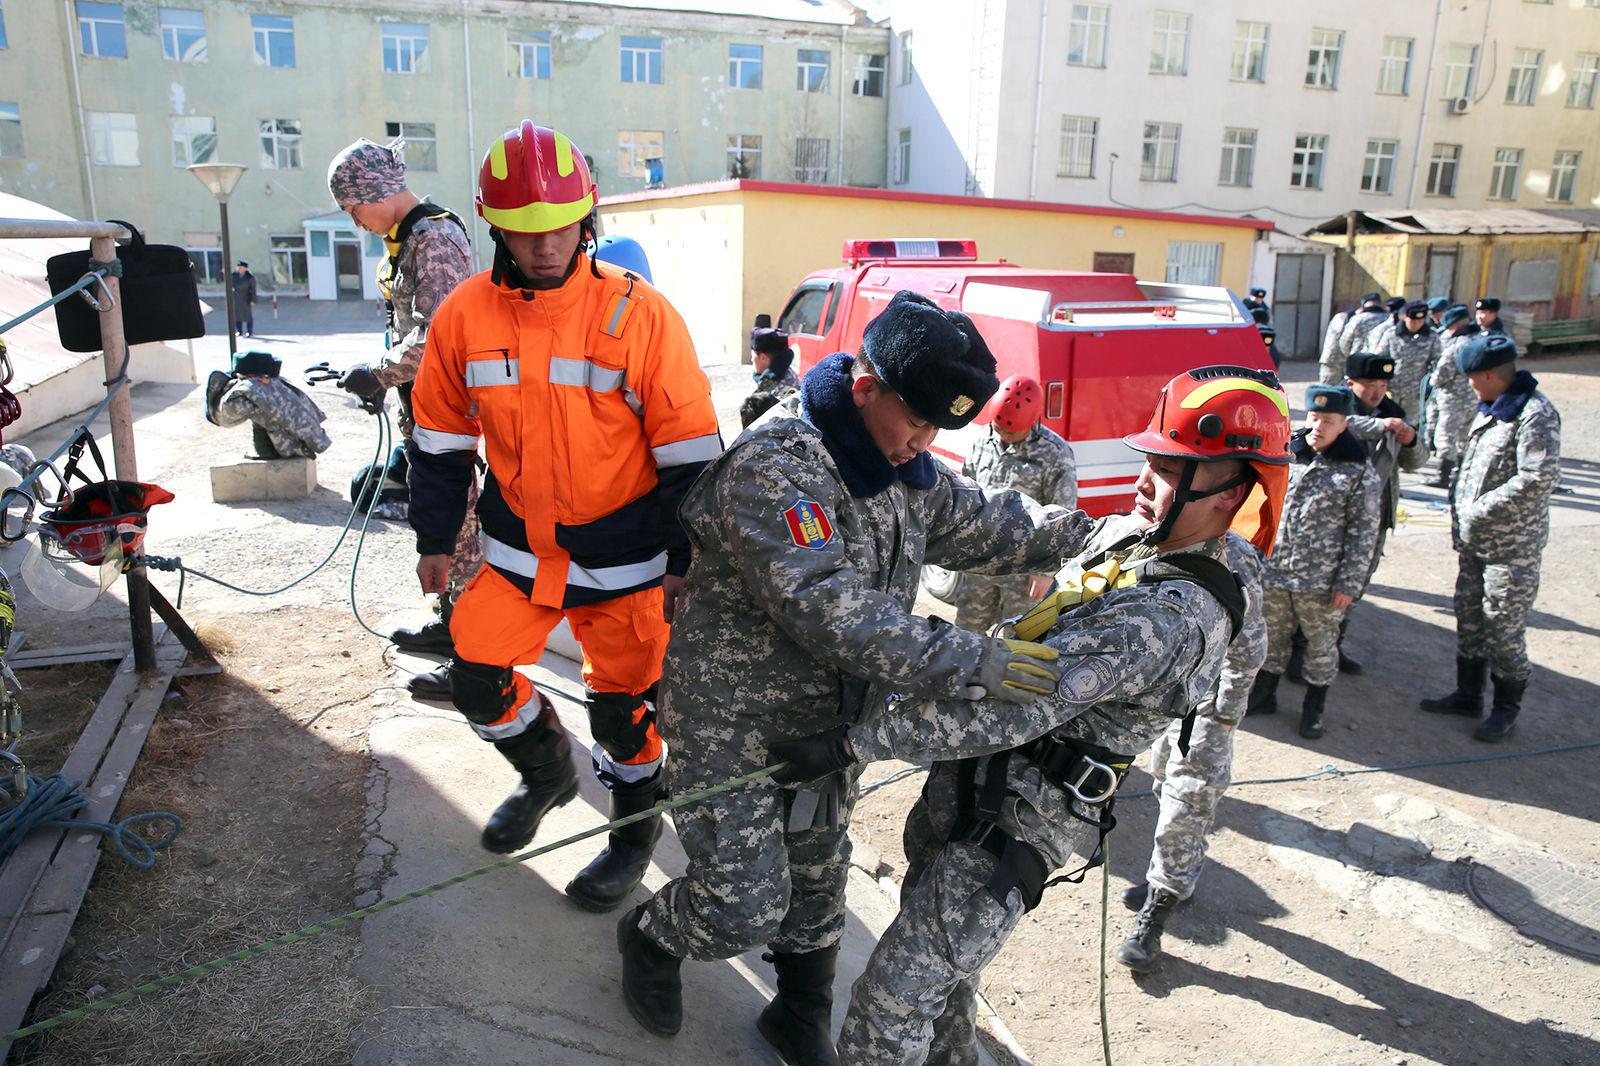 2141d4_159A2735_x974 Япон аврагчид Монголд иржээ